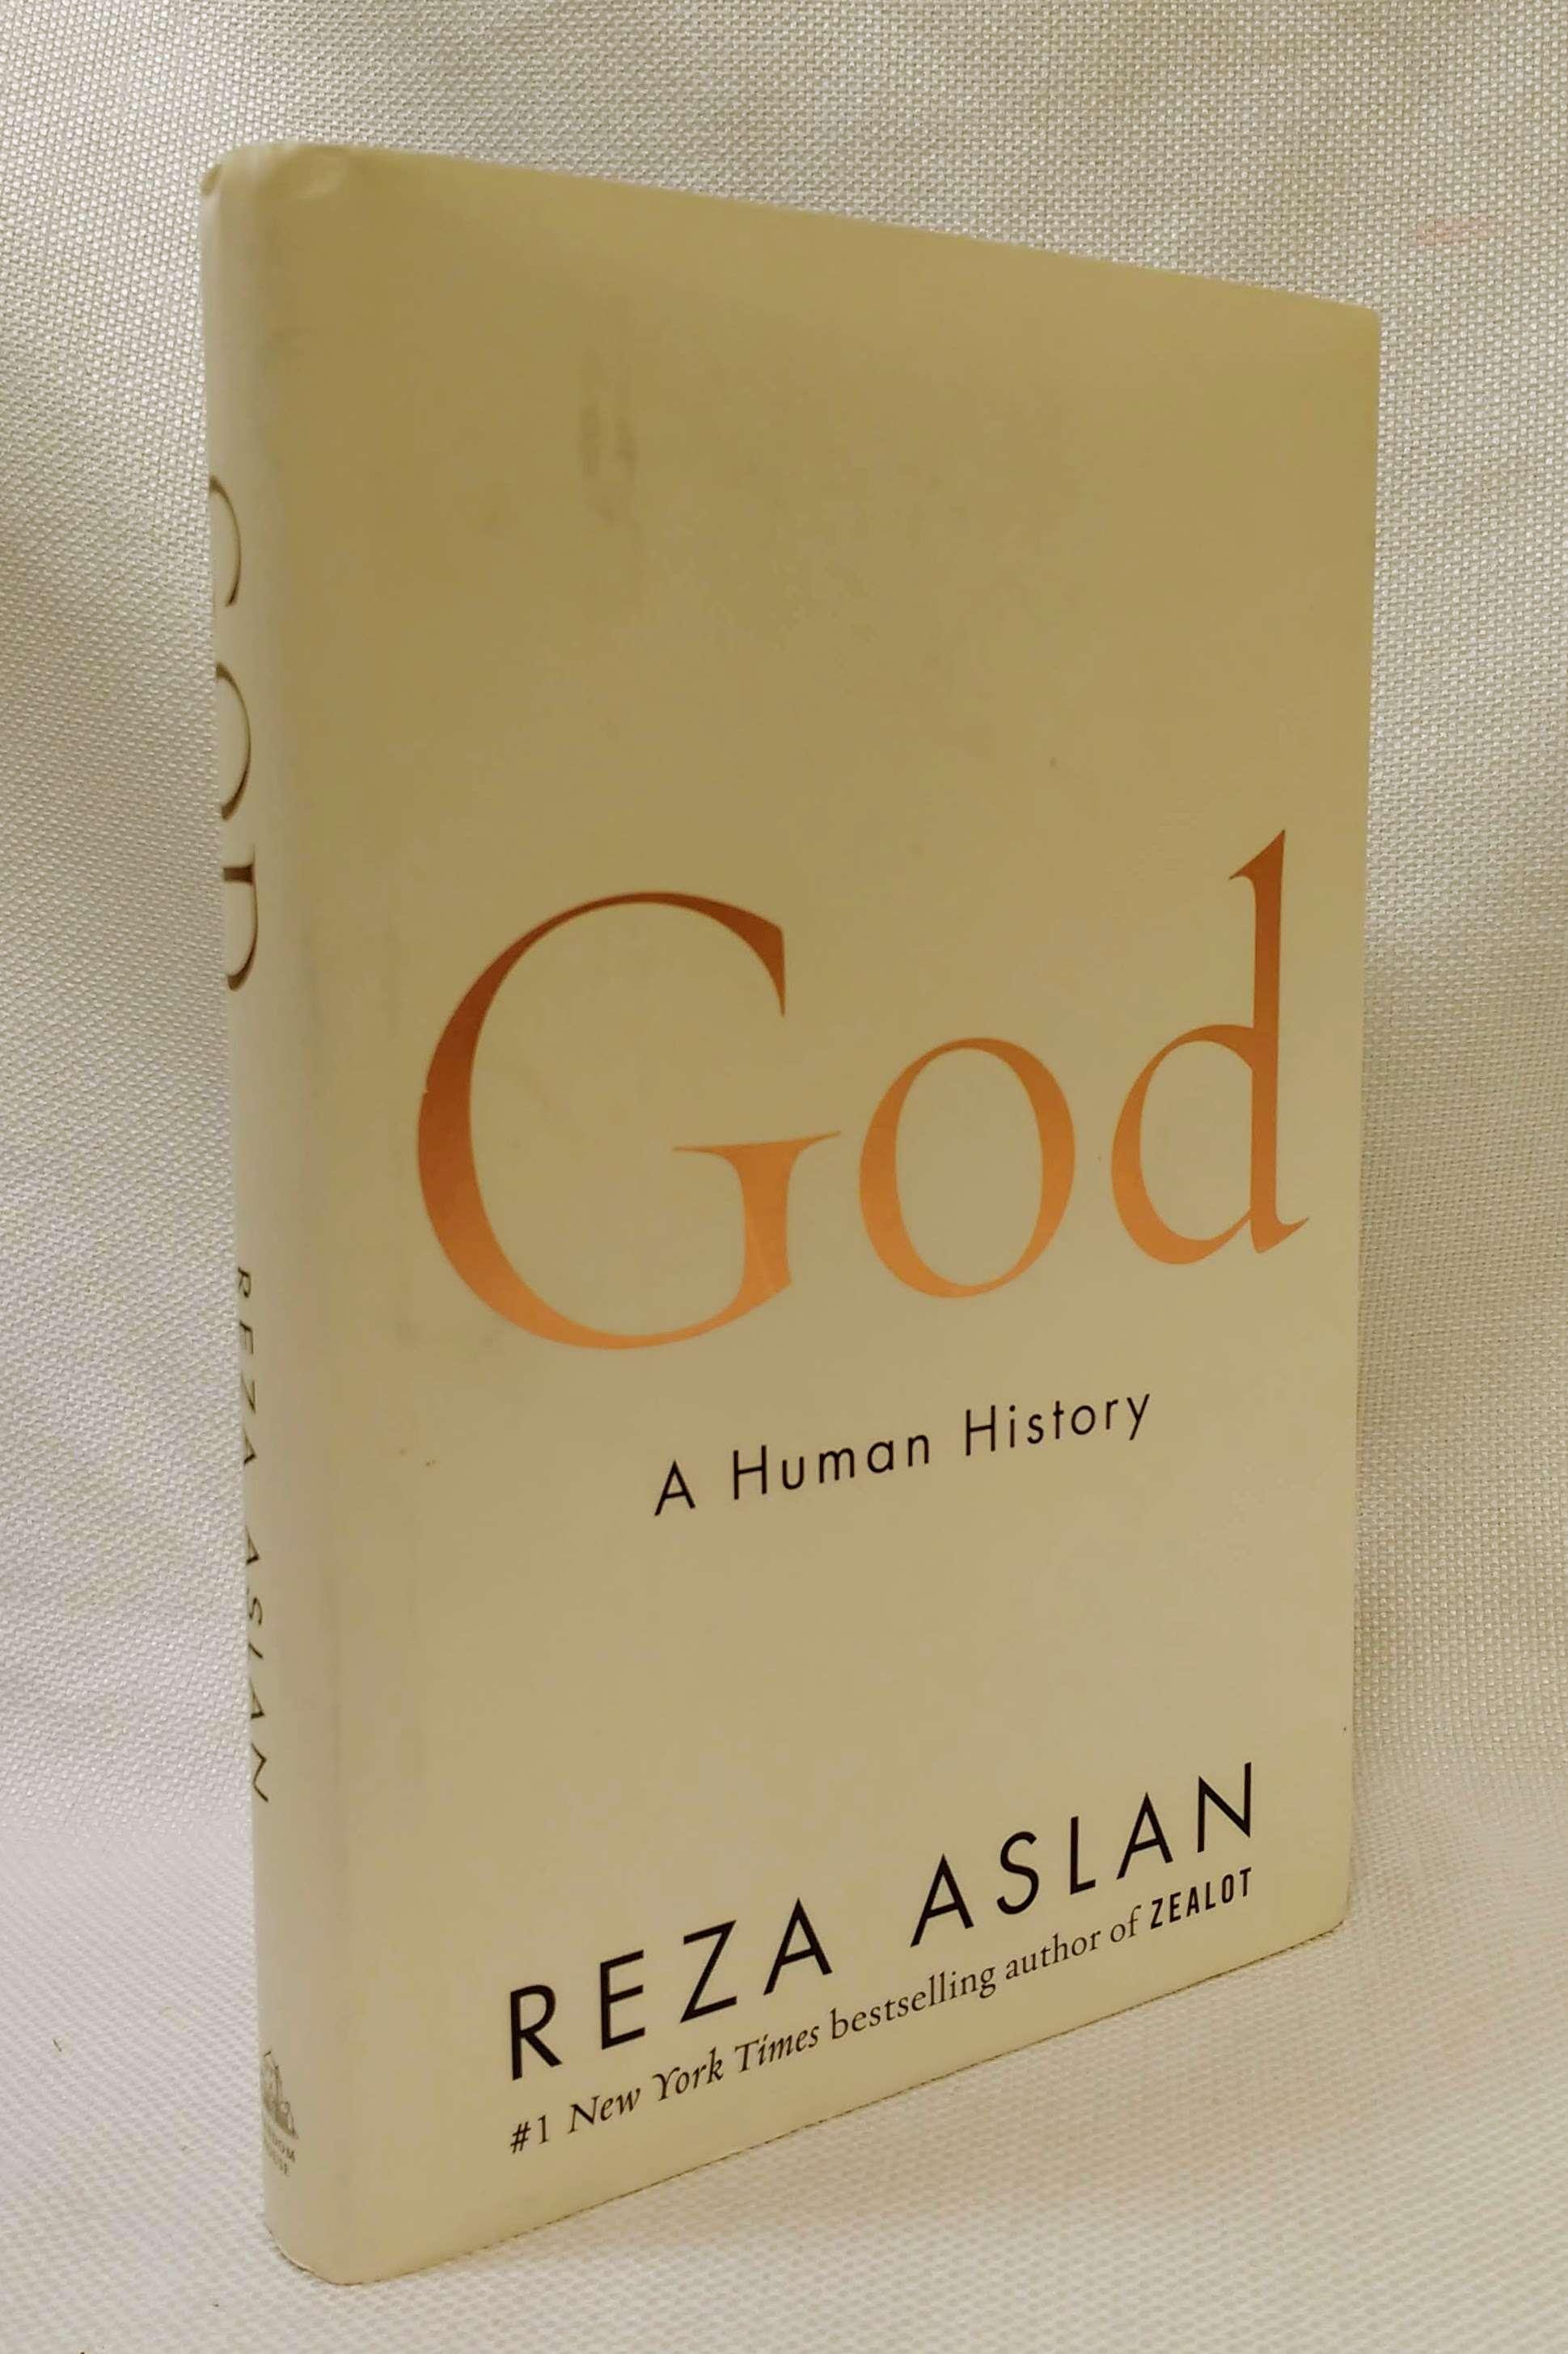 God: A Human History, Aslan, Reza